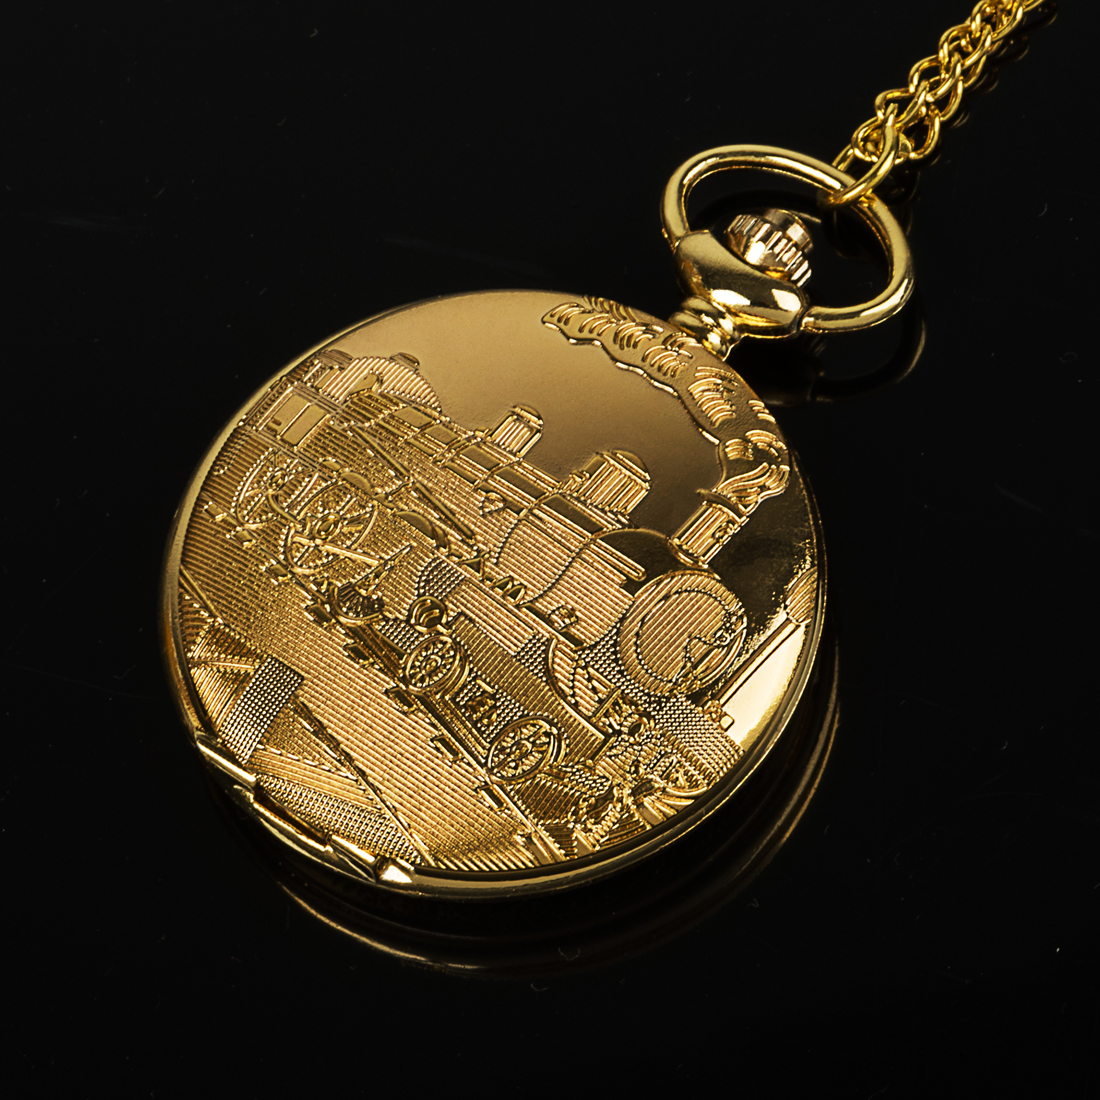 Vintage Gold Locomotive Motor Railway Train Steampunk Pocket Watch For Men Women Charming Pendant Necklace Clock Relogio Bolso